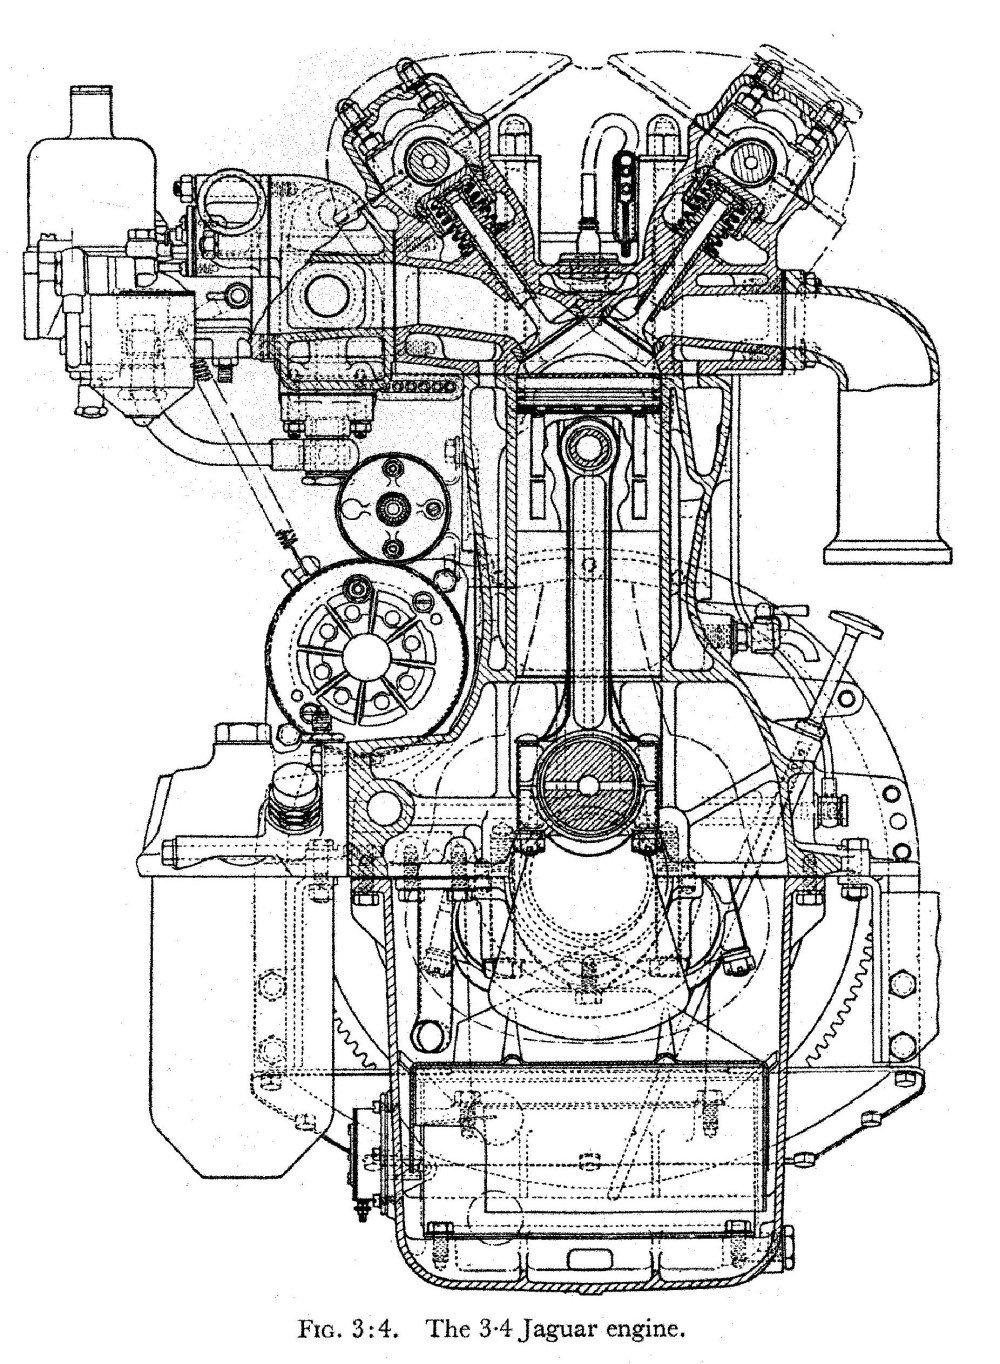 medium resolution of image 9 of 24 1949 jaguar xk straight six